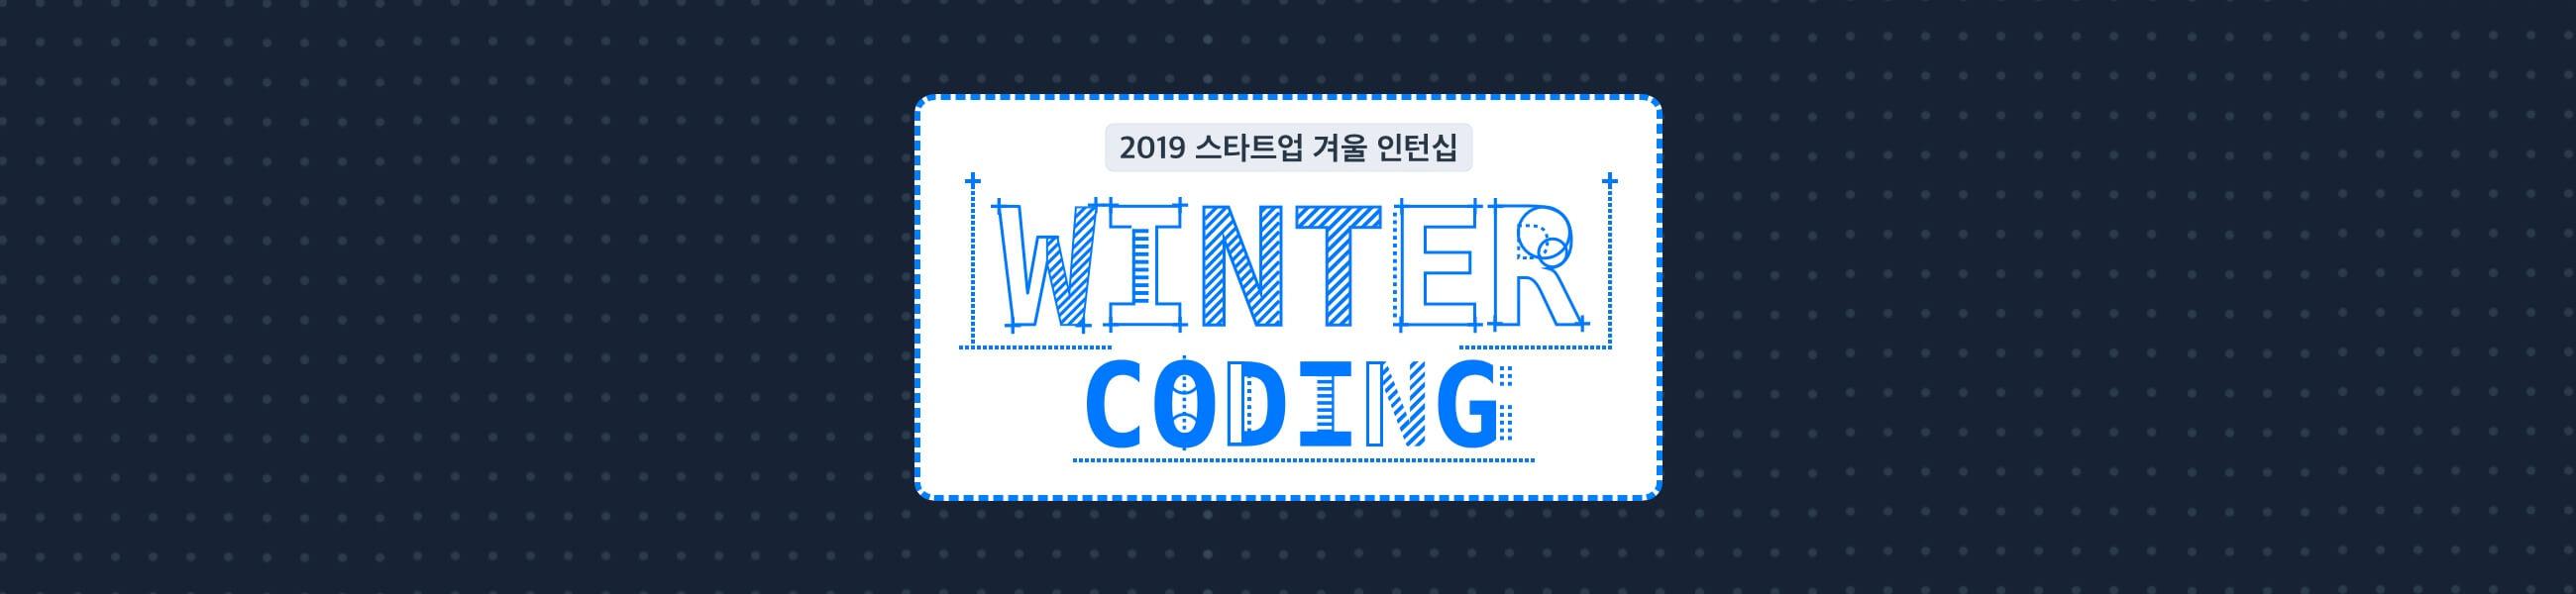 2019 Winter Coding - 겨울방학 스타트업 인턴 프로그램의 이미지